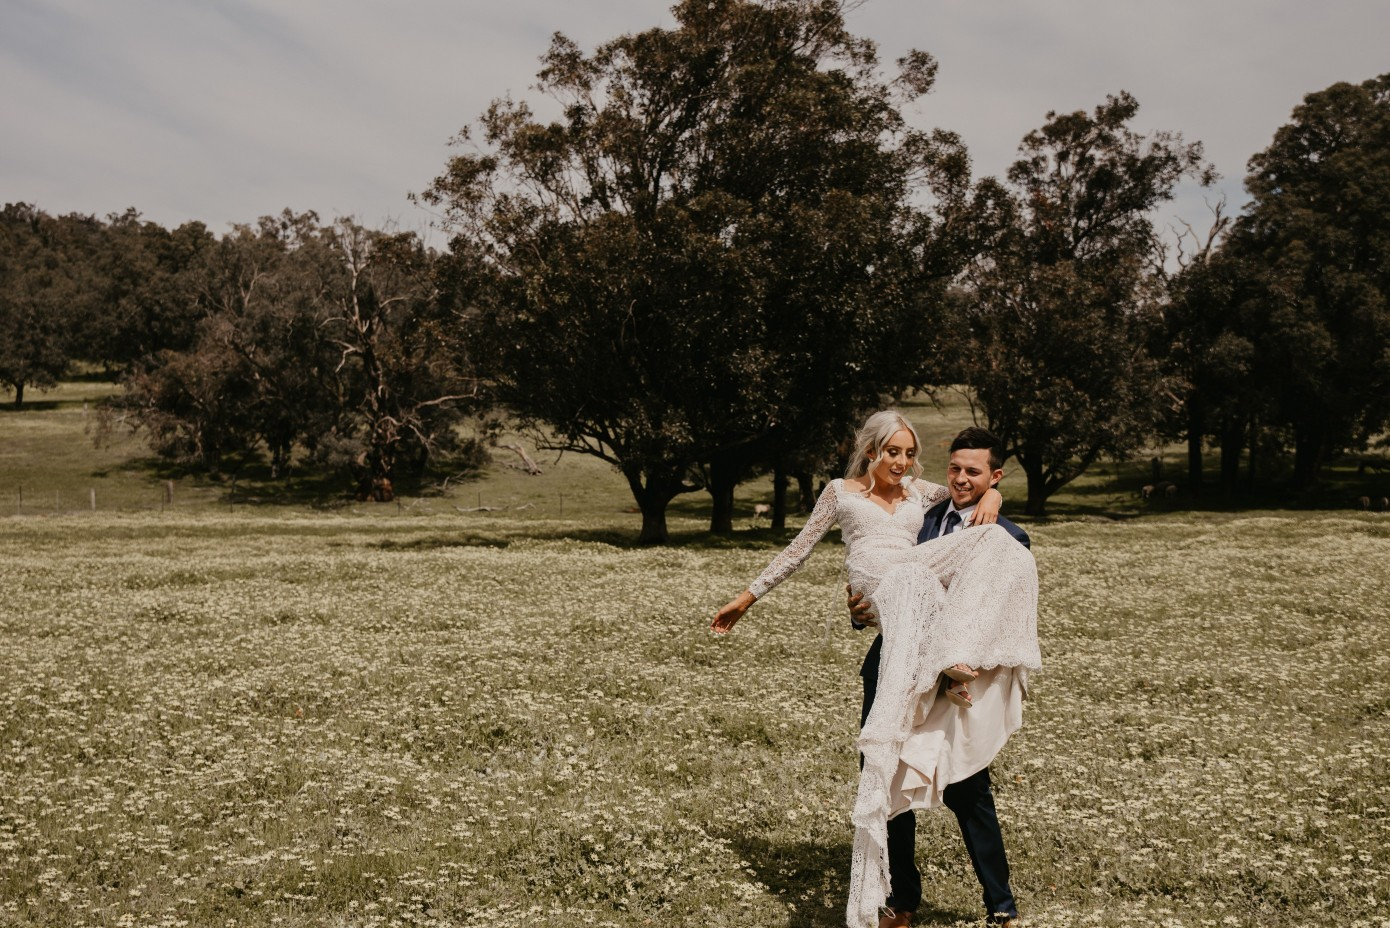 LOVE: AMY & JAMIE   THE WEDDING PERTH BUILT IN ONE WEEK